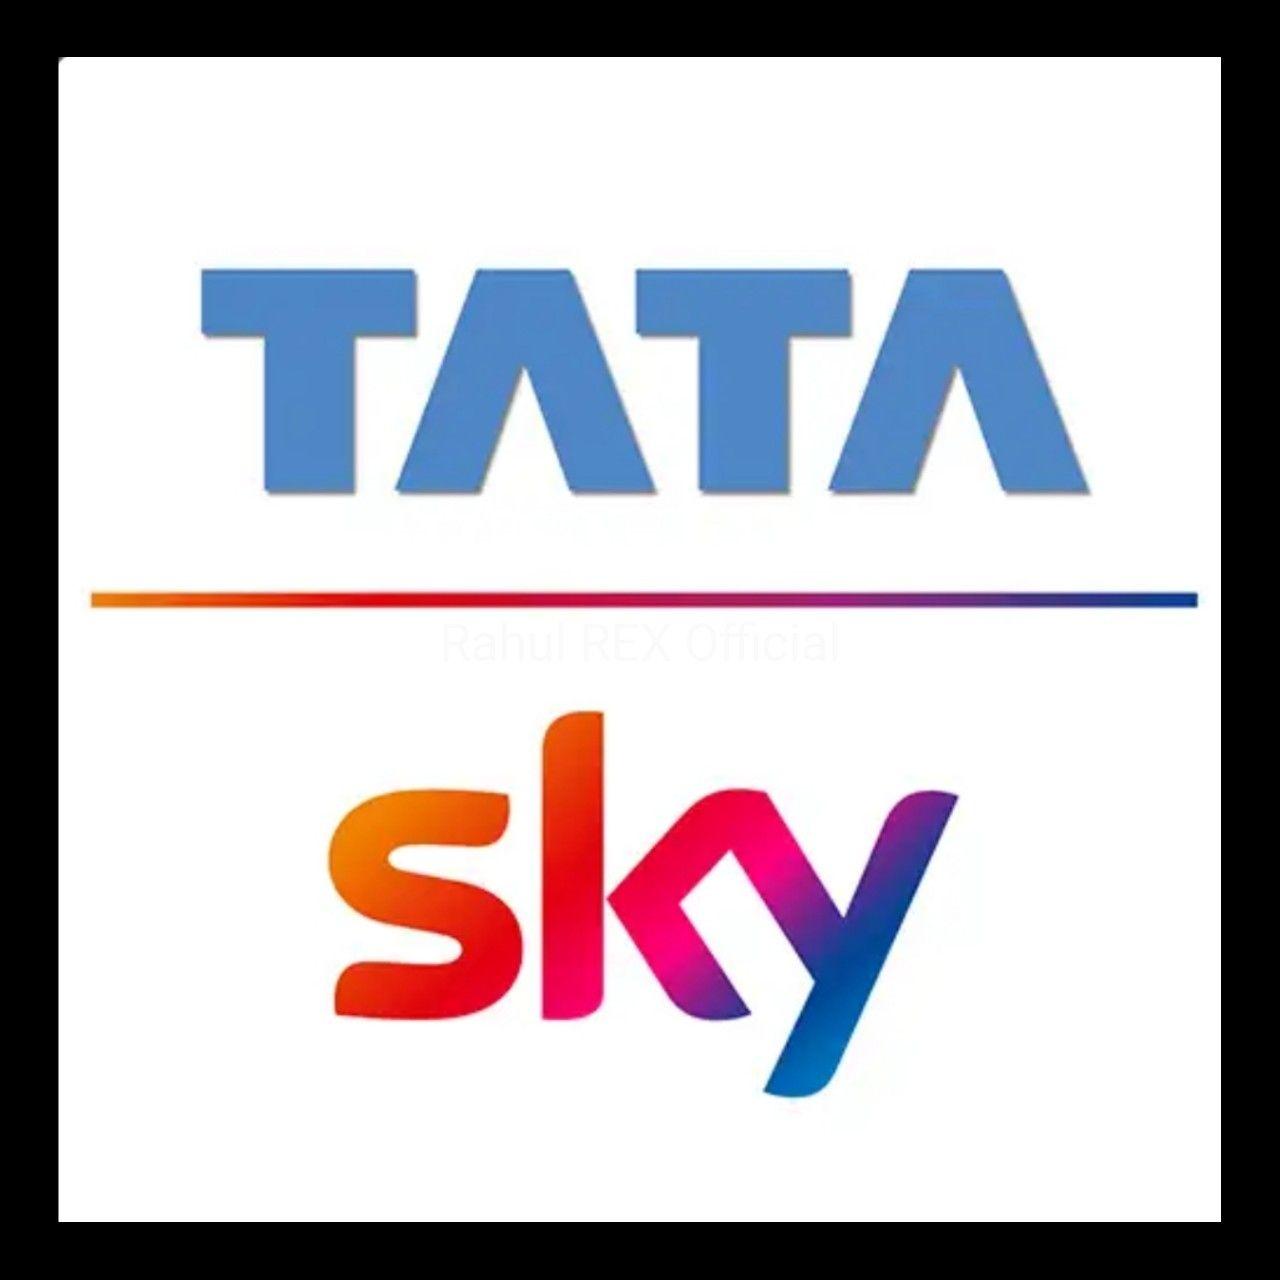 Tata Sky Tv Web Sreies Movies Platform Rahul Rex Logo Collections Rahulrex Live Tv Tv Services Mobile Network Operator